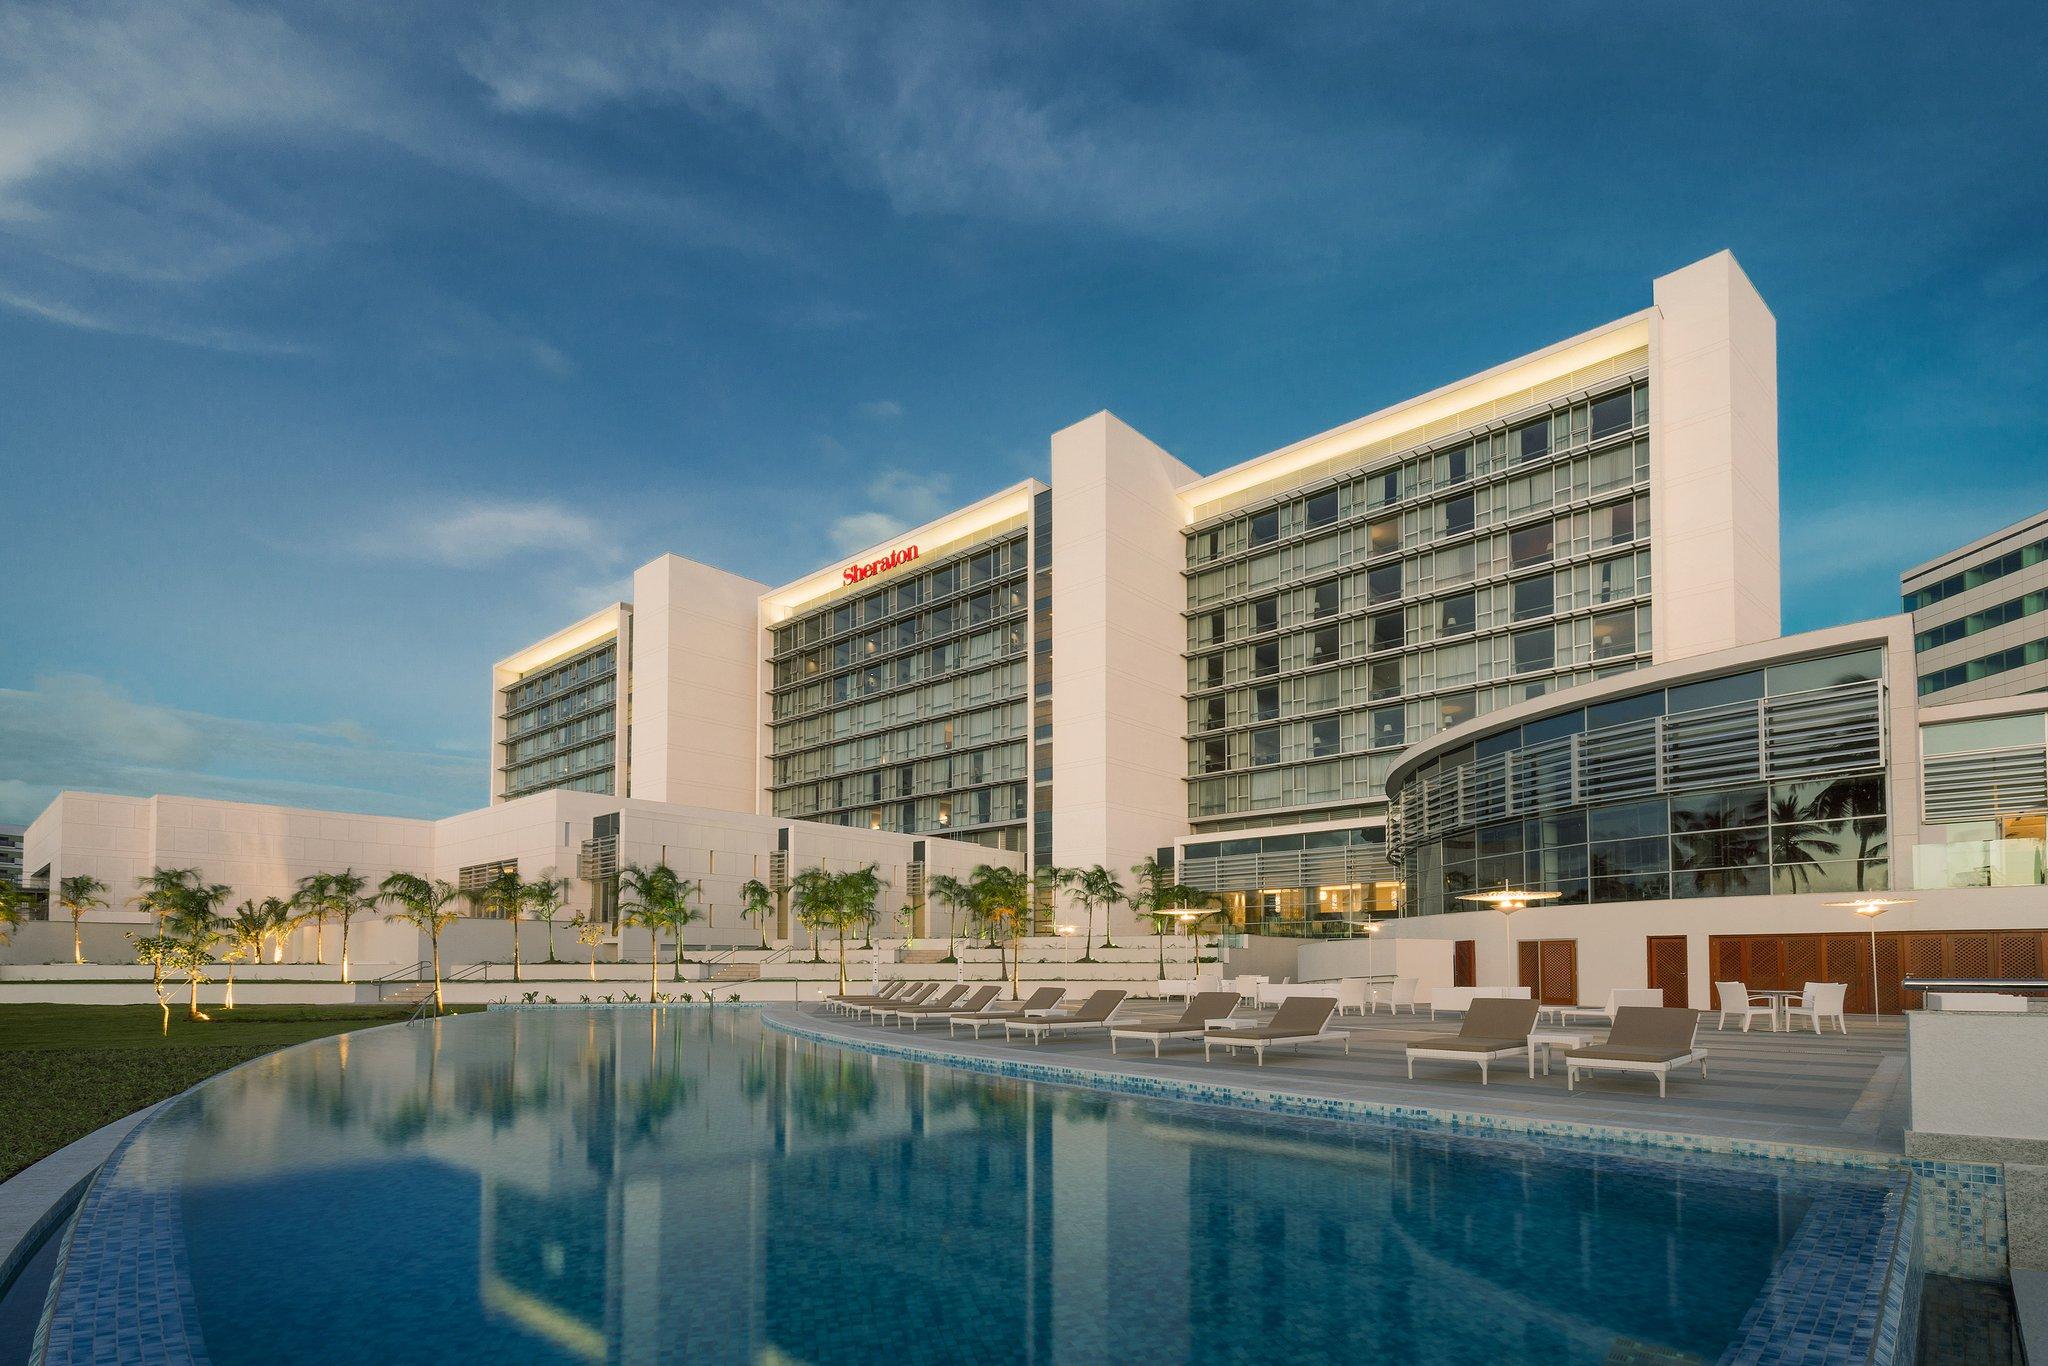 Sheraton Reserva do Paiva Hotel/Conv Ctr